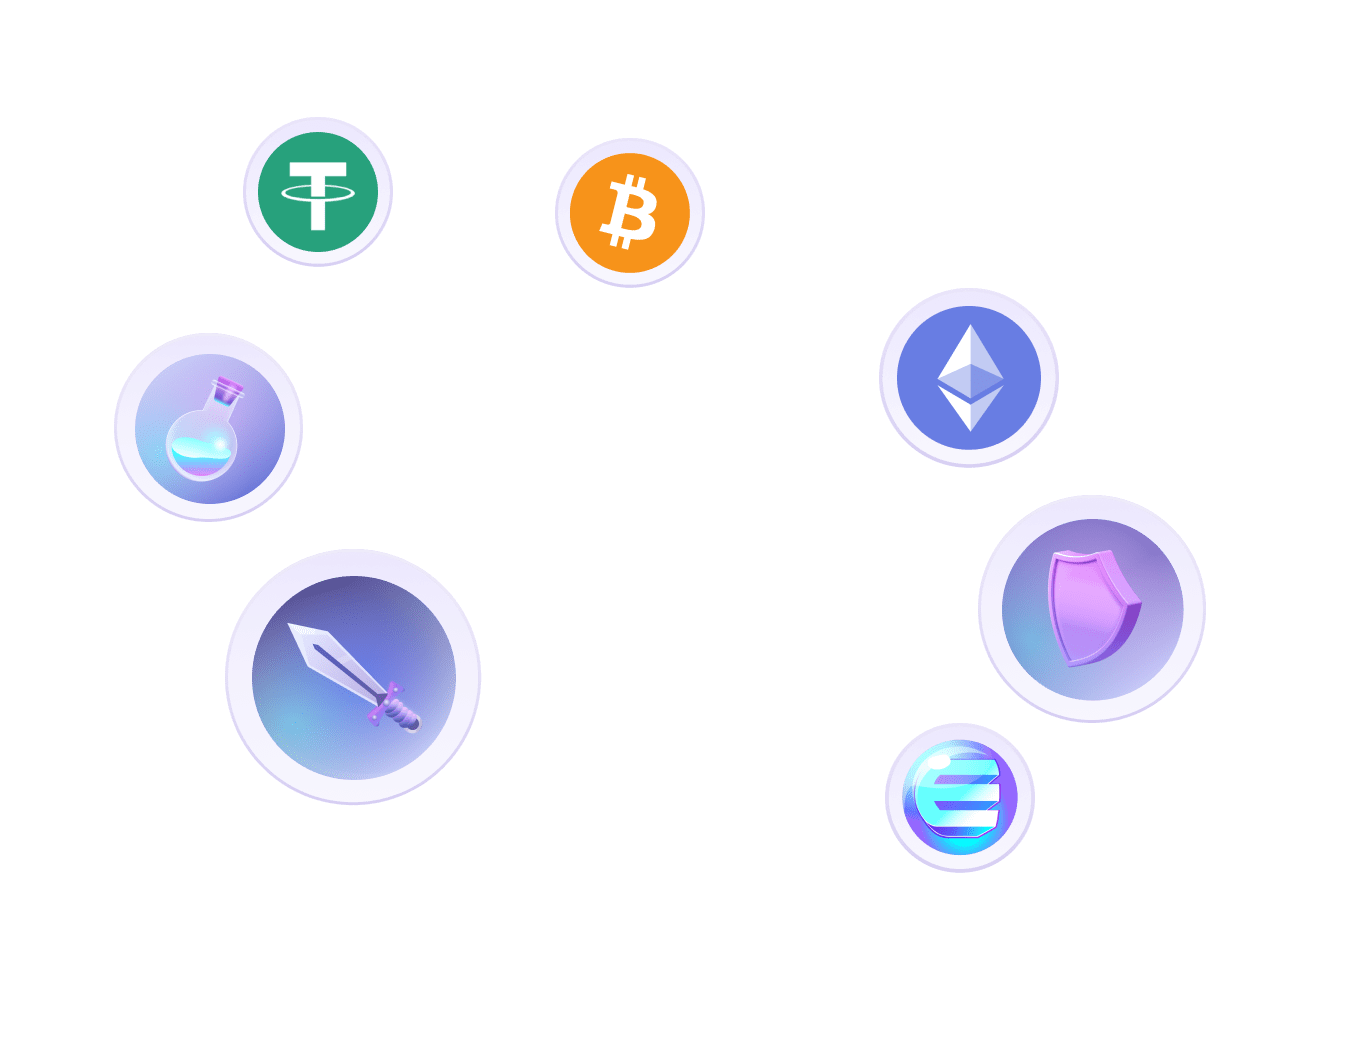 Wallet Logos